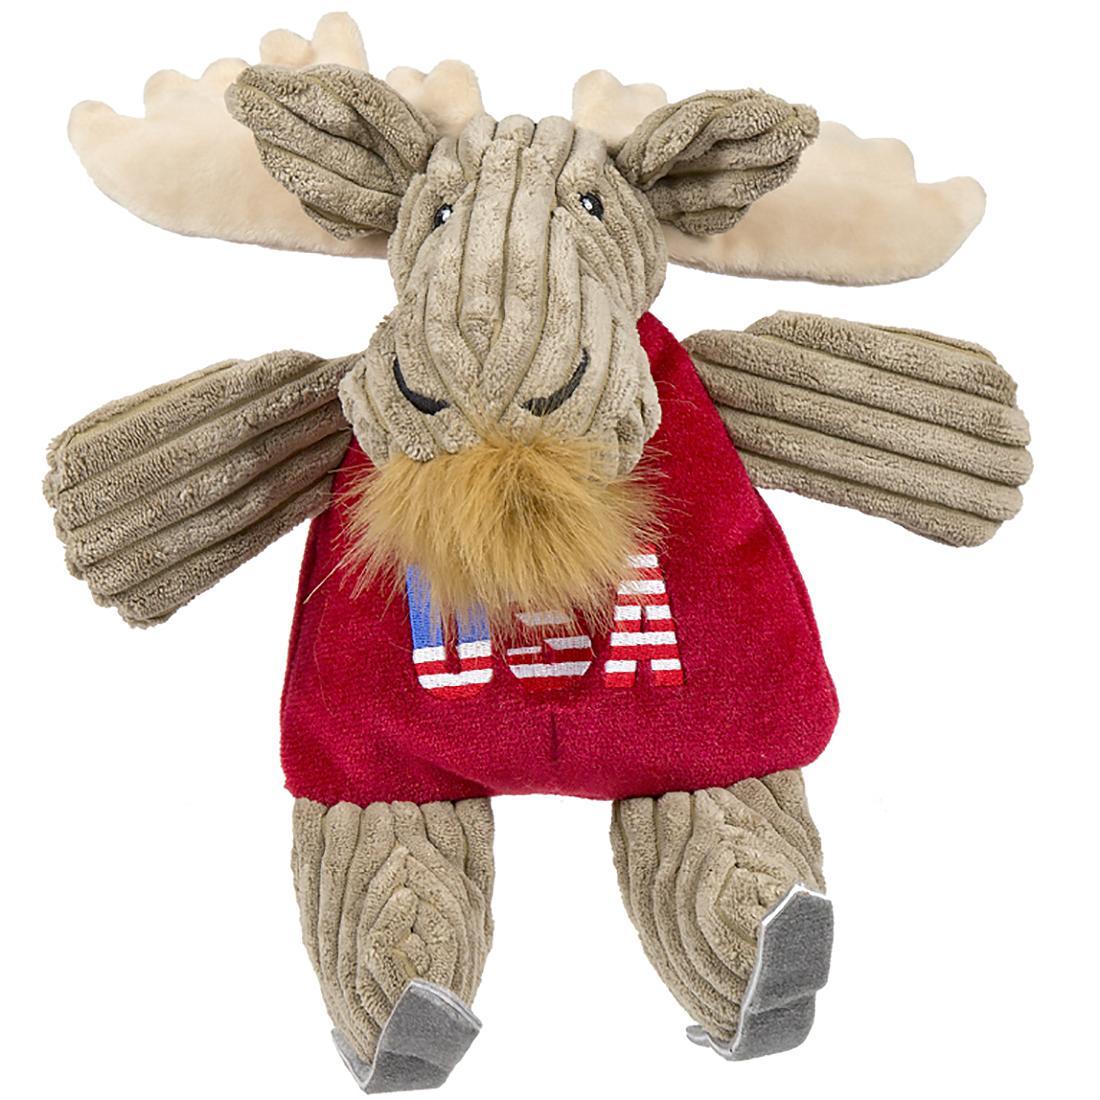 HuggleHounds Chubbie Buddie Plush Dog Toy - Moose Skier